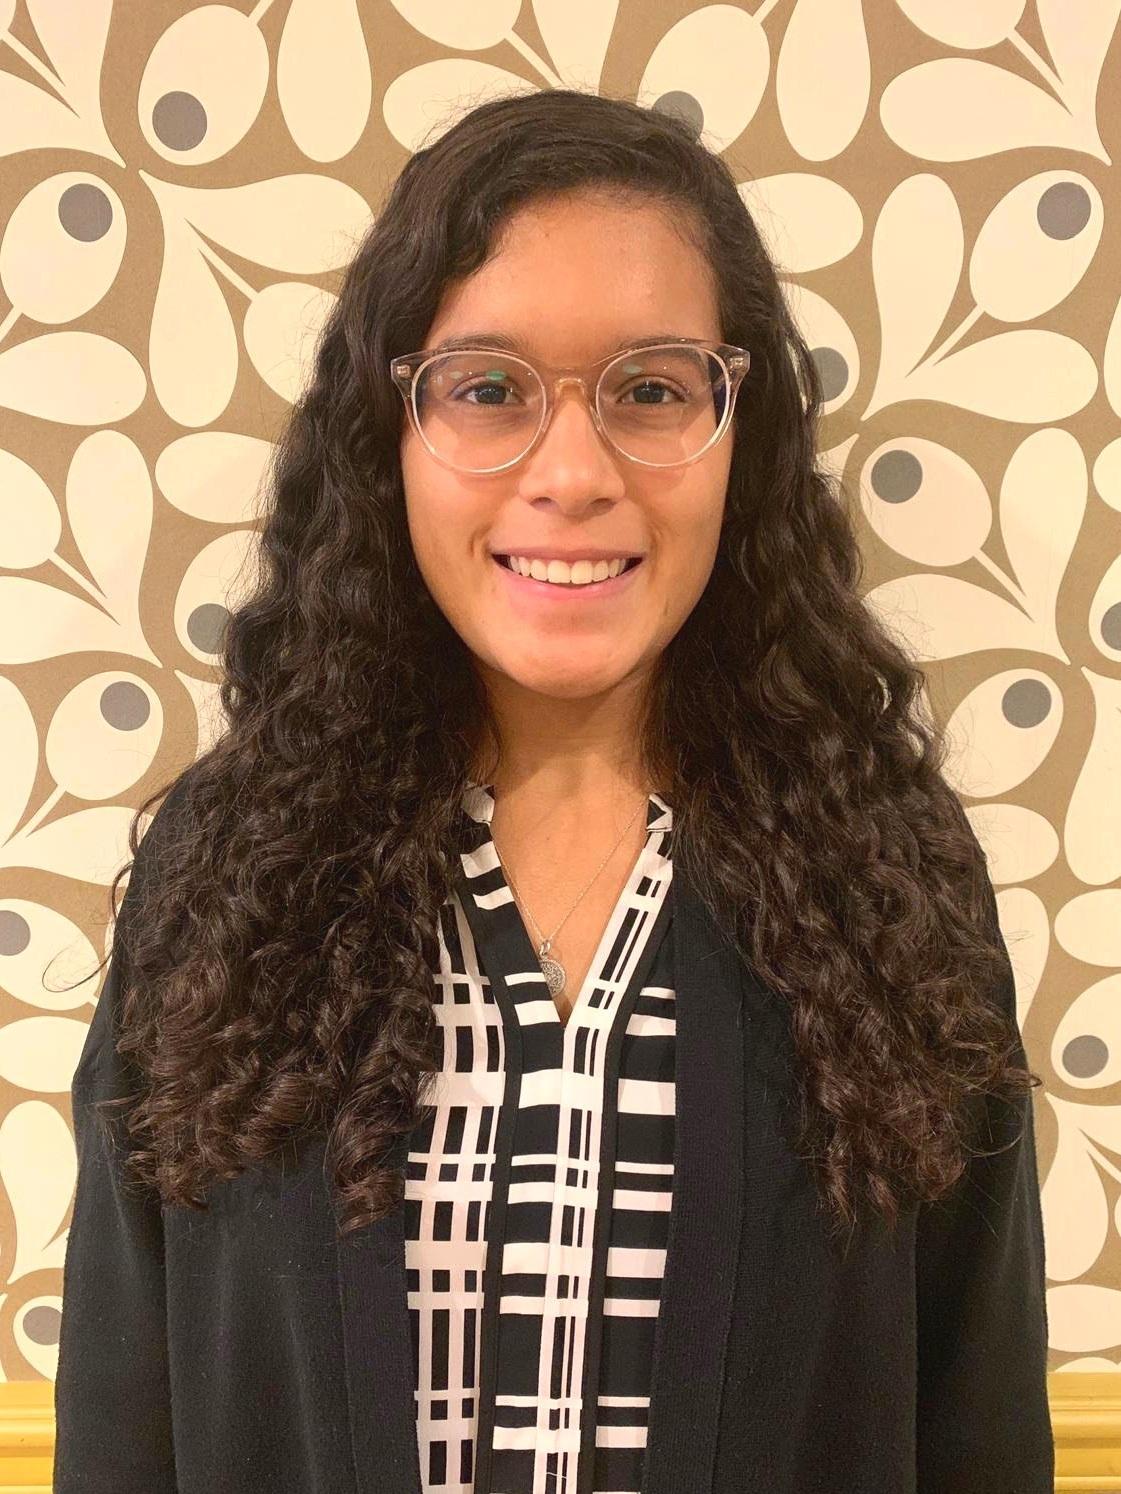 Angelica Estevez, Executive Assistant to the Chairman